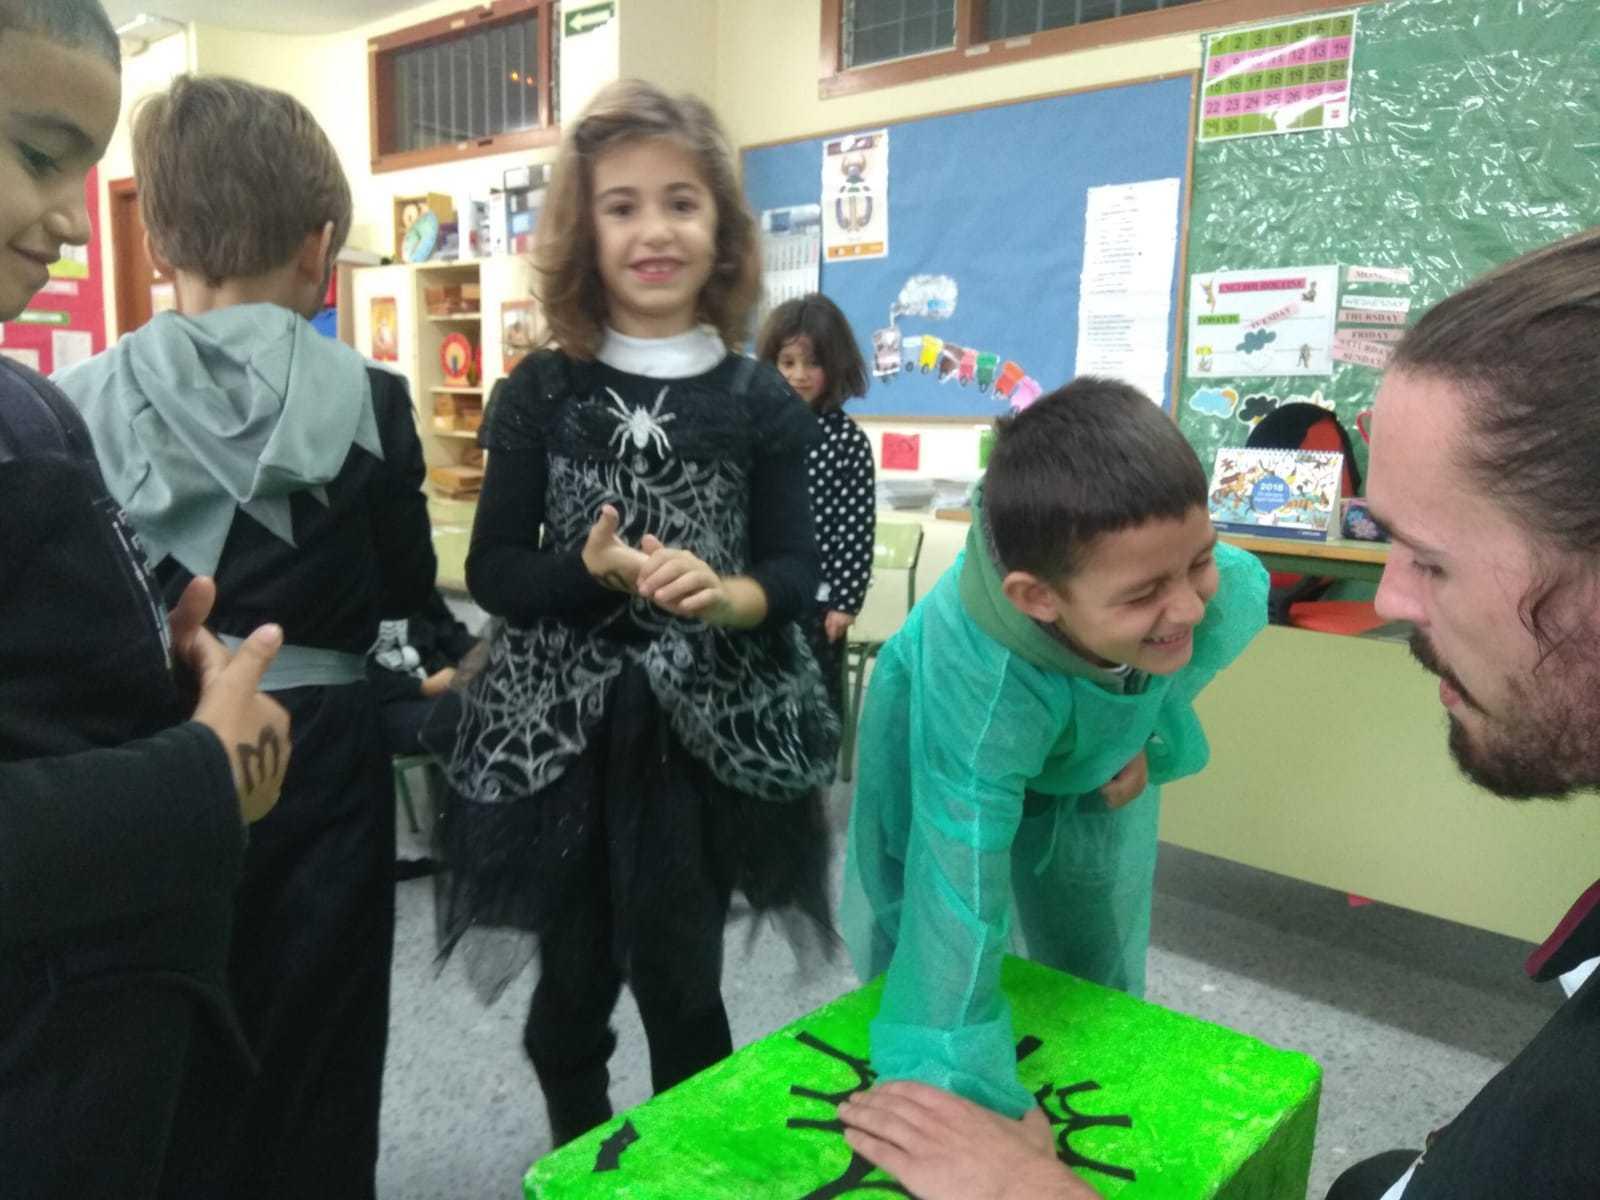 2018_10_31_1º disfruta terrorificamente en Halloween_CEIP FDLR_Las Rozas 23